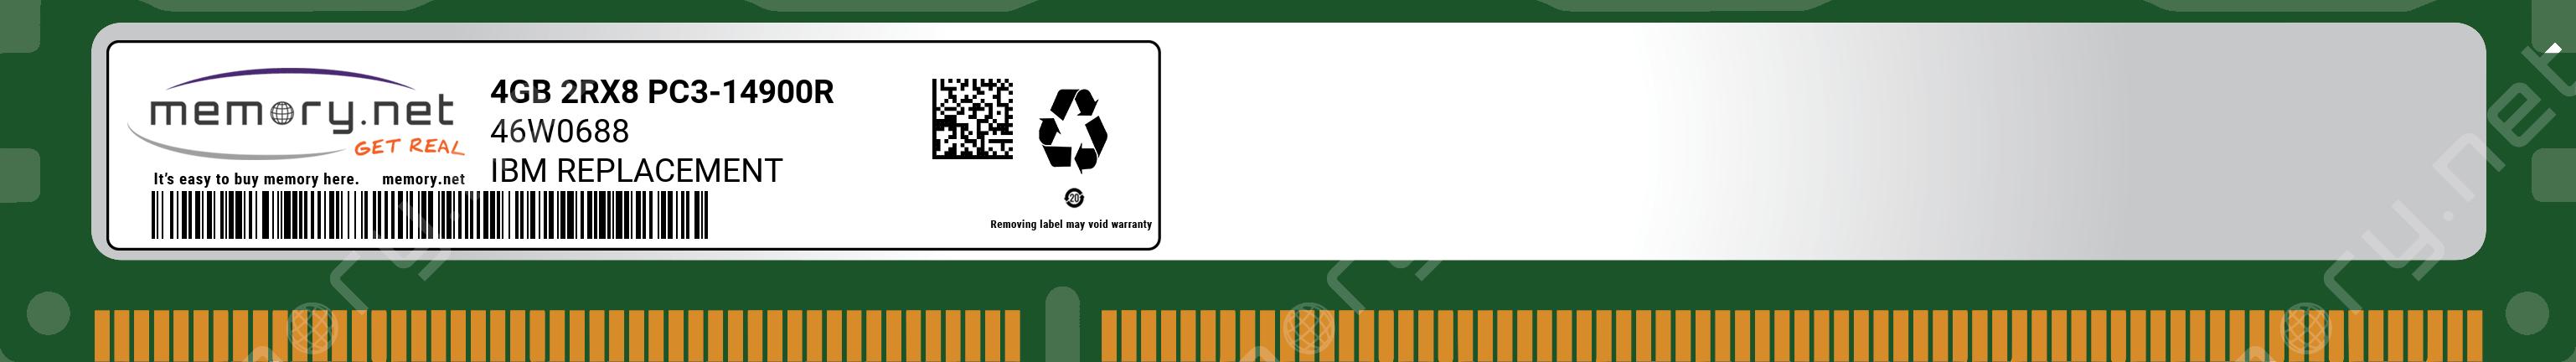 46W0688